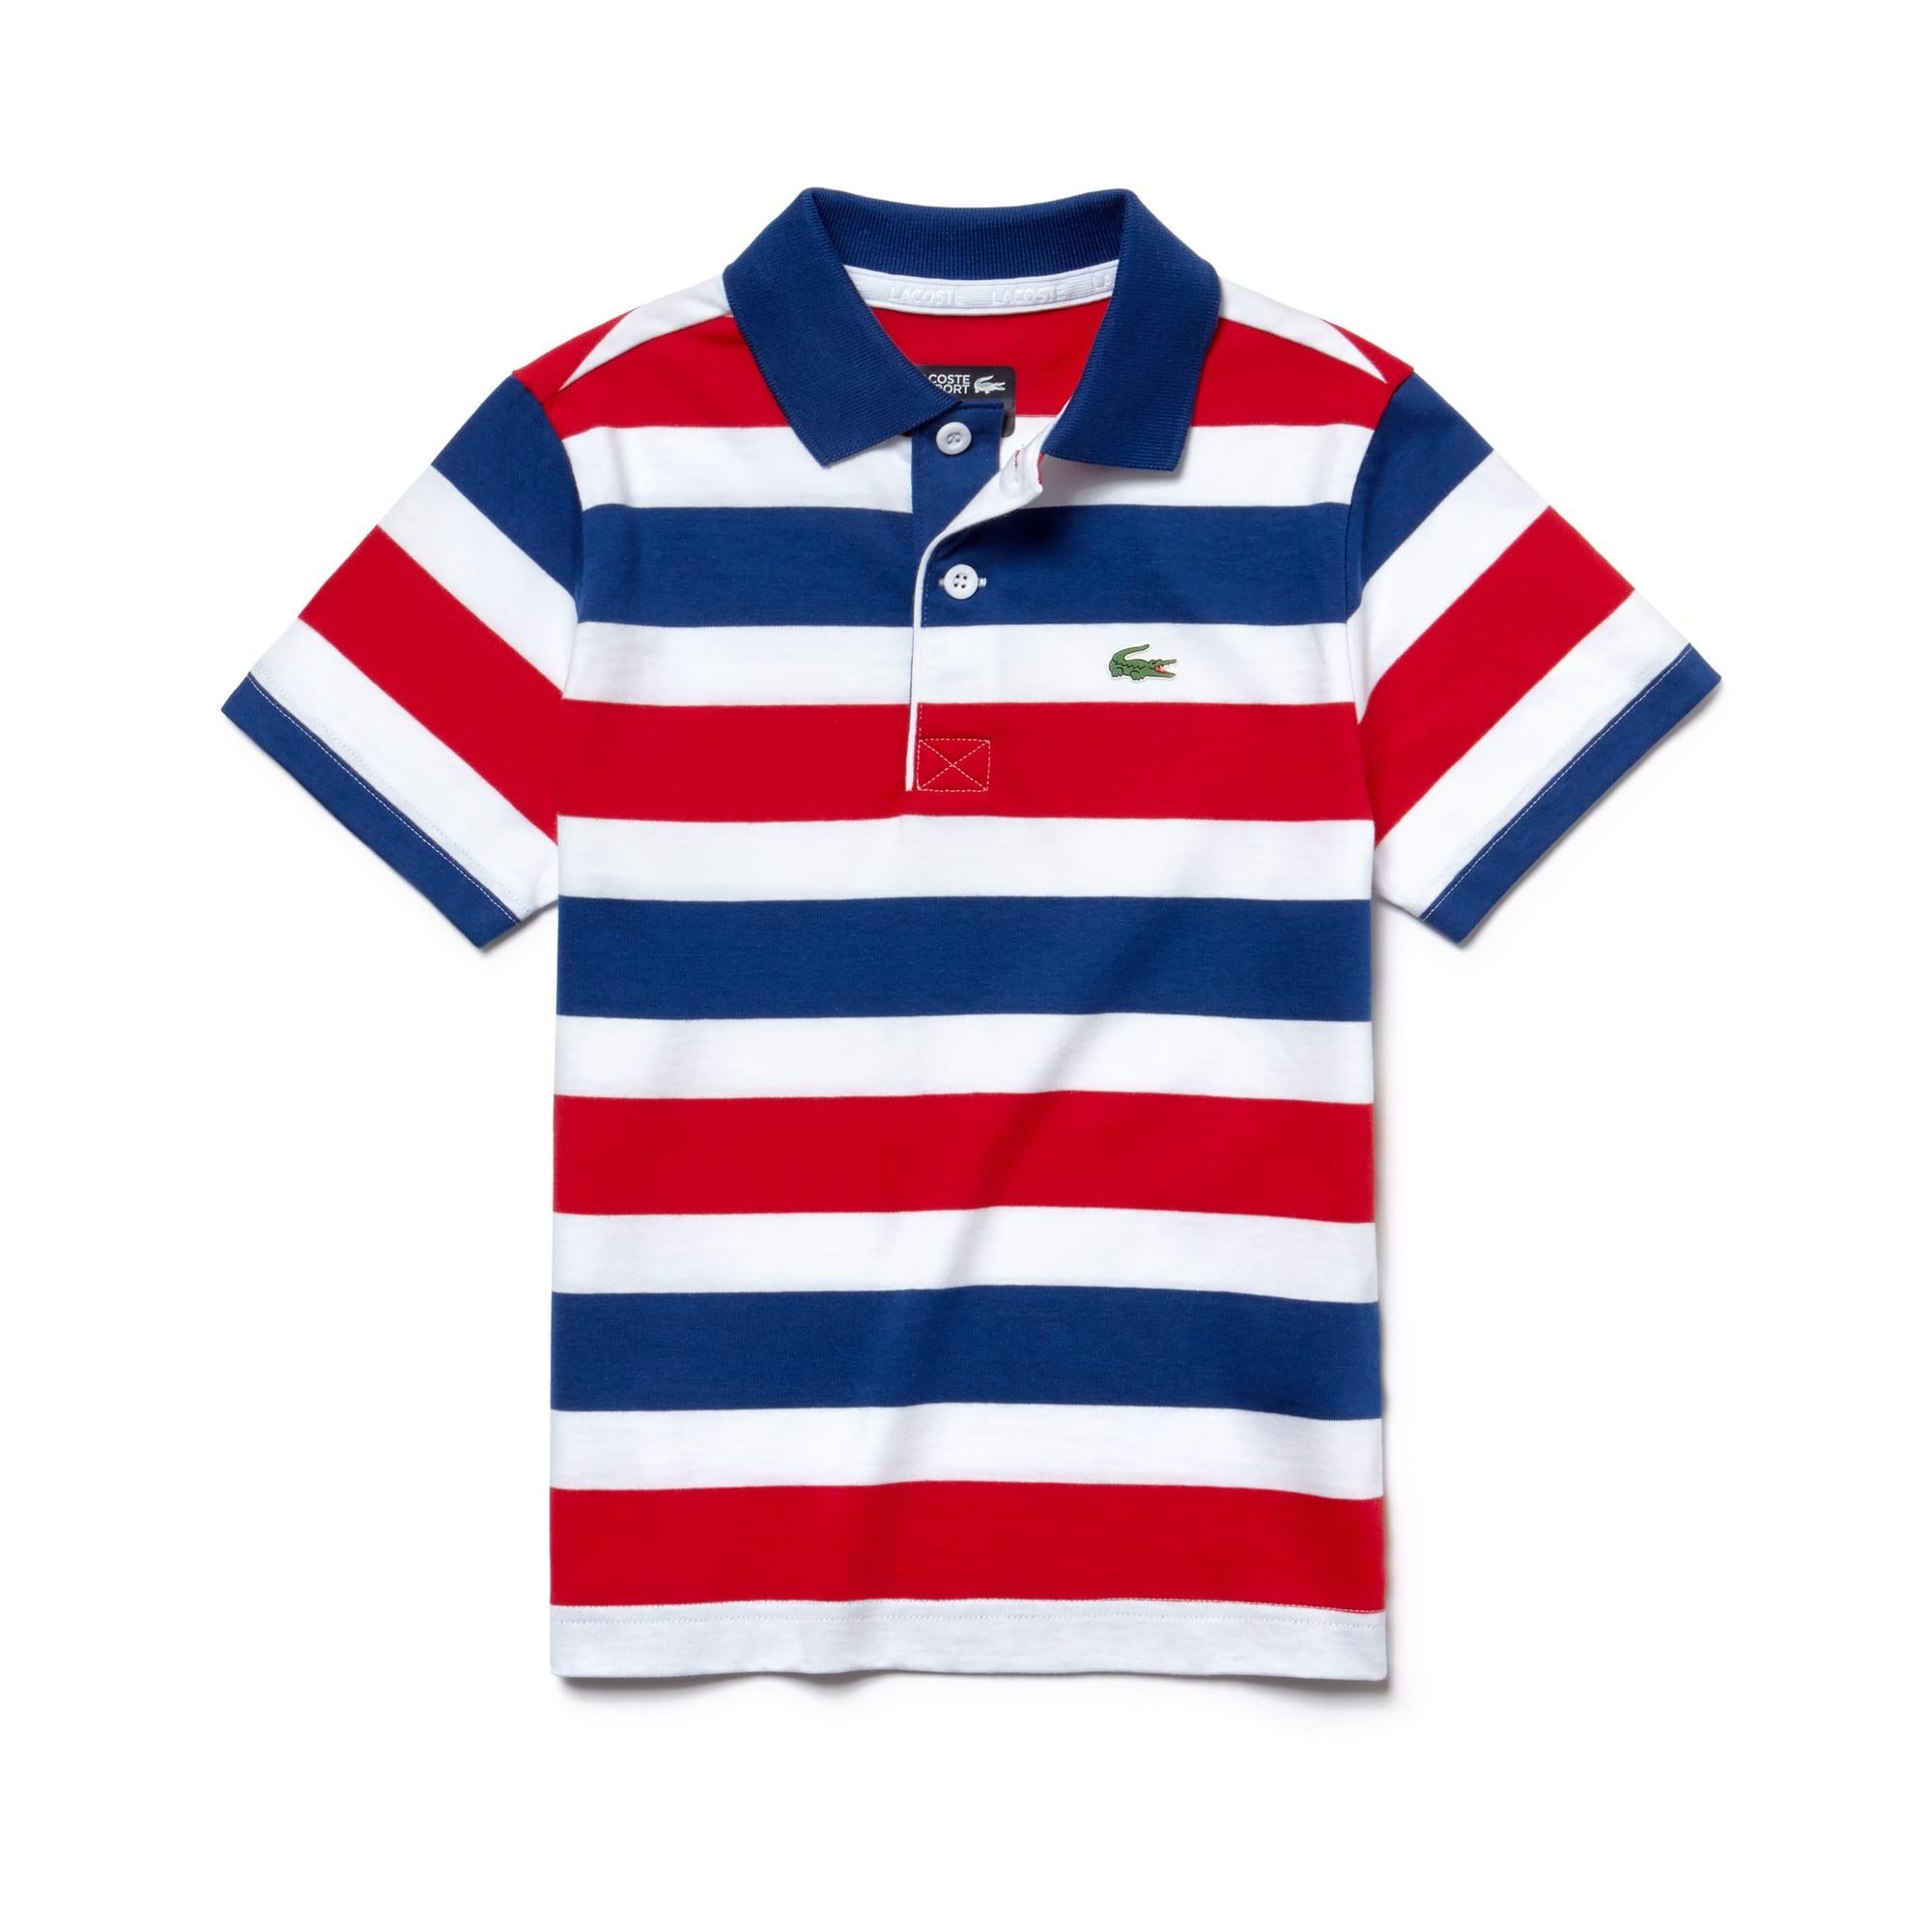 cb9e8e3160f378 Boys  SPORT Striped Cotton Tennis Polo